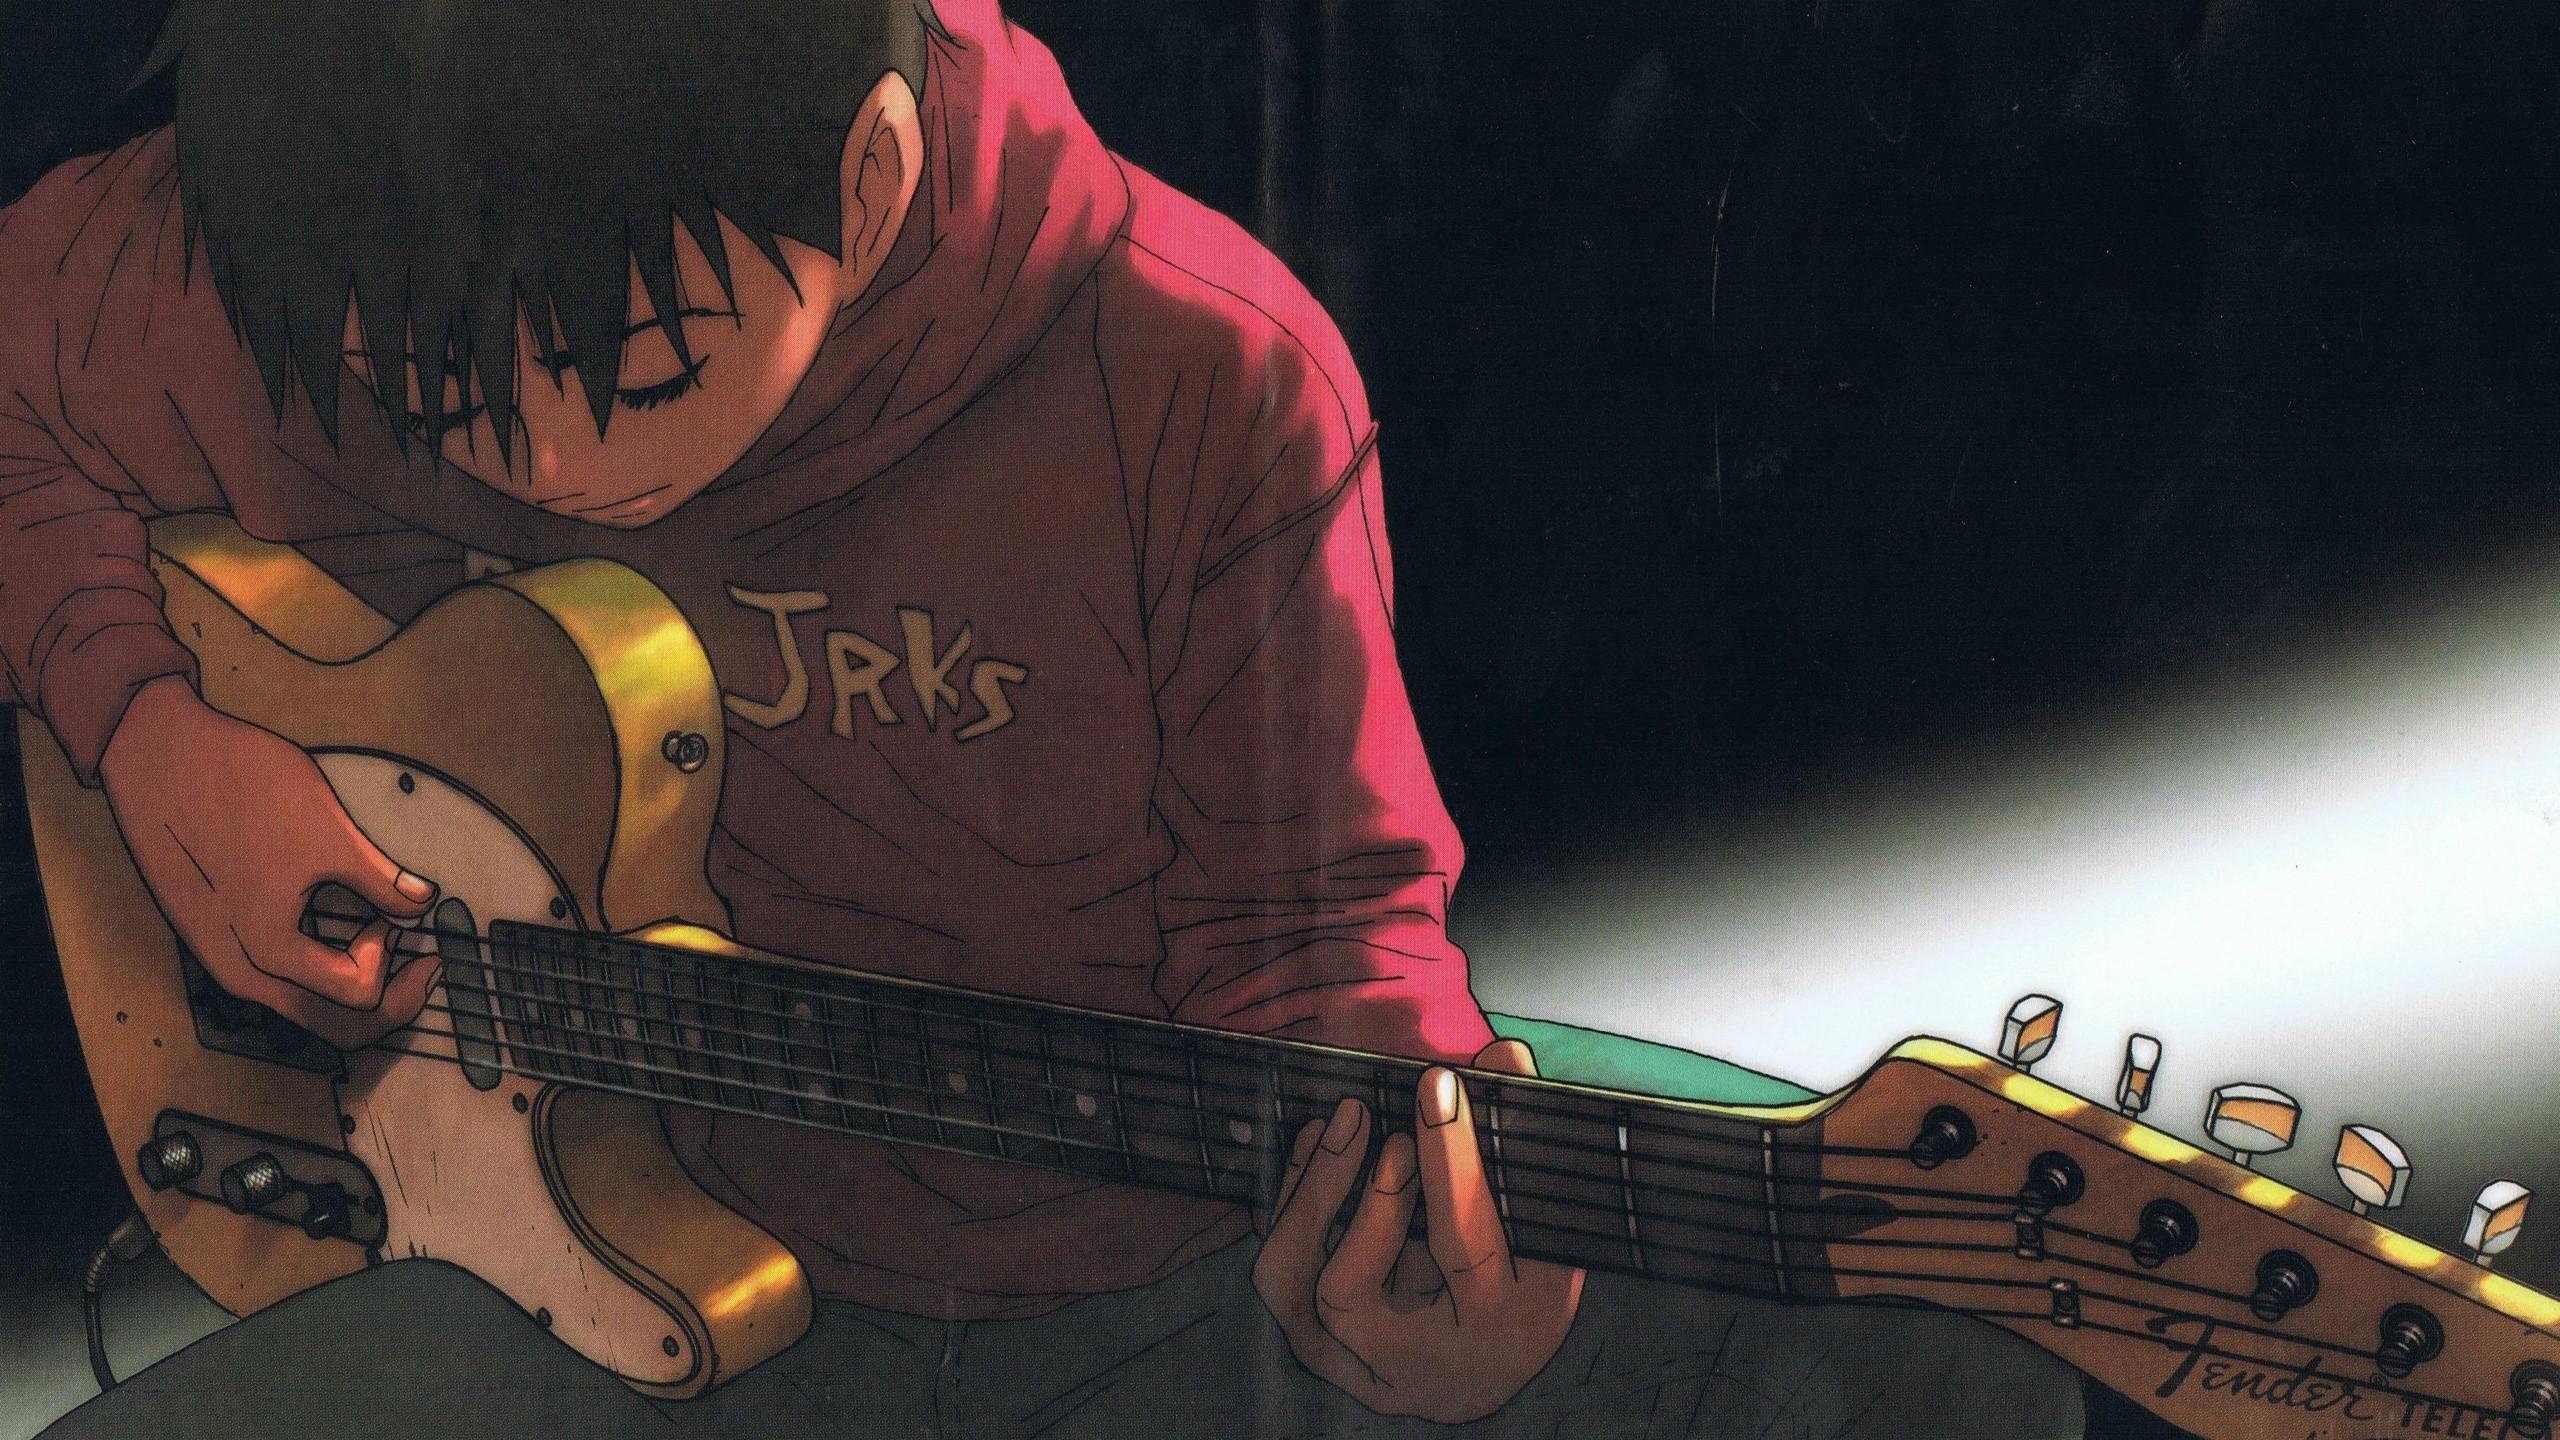 Guitar, Pleasure, Fender, Tanaka Yukio, Beck, Telecaster, Mongolian Chop  Squad